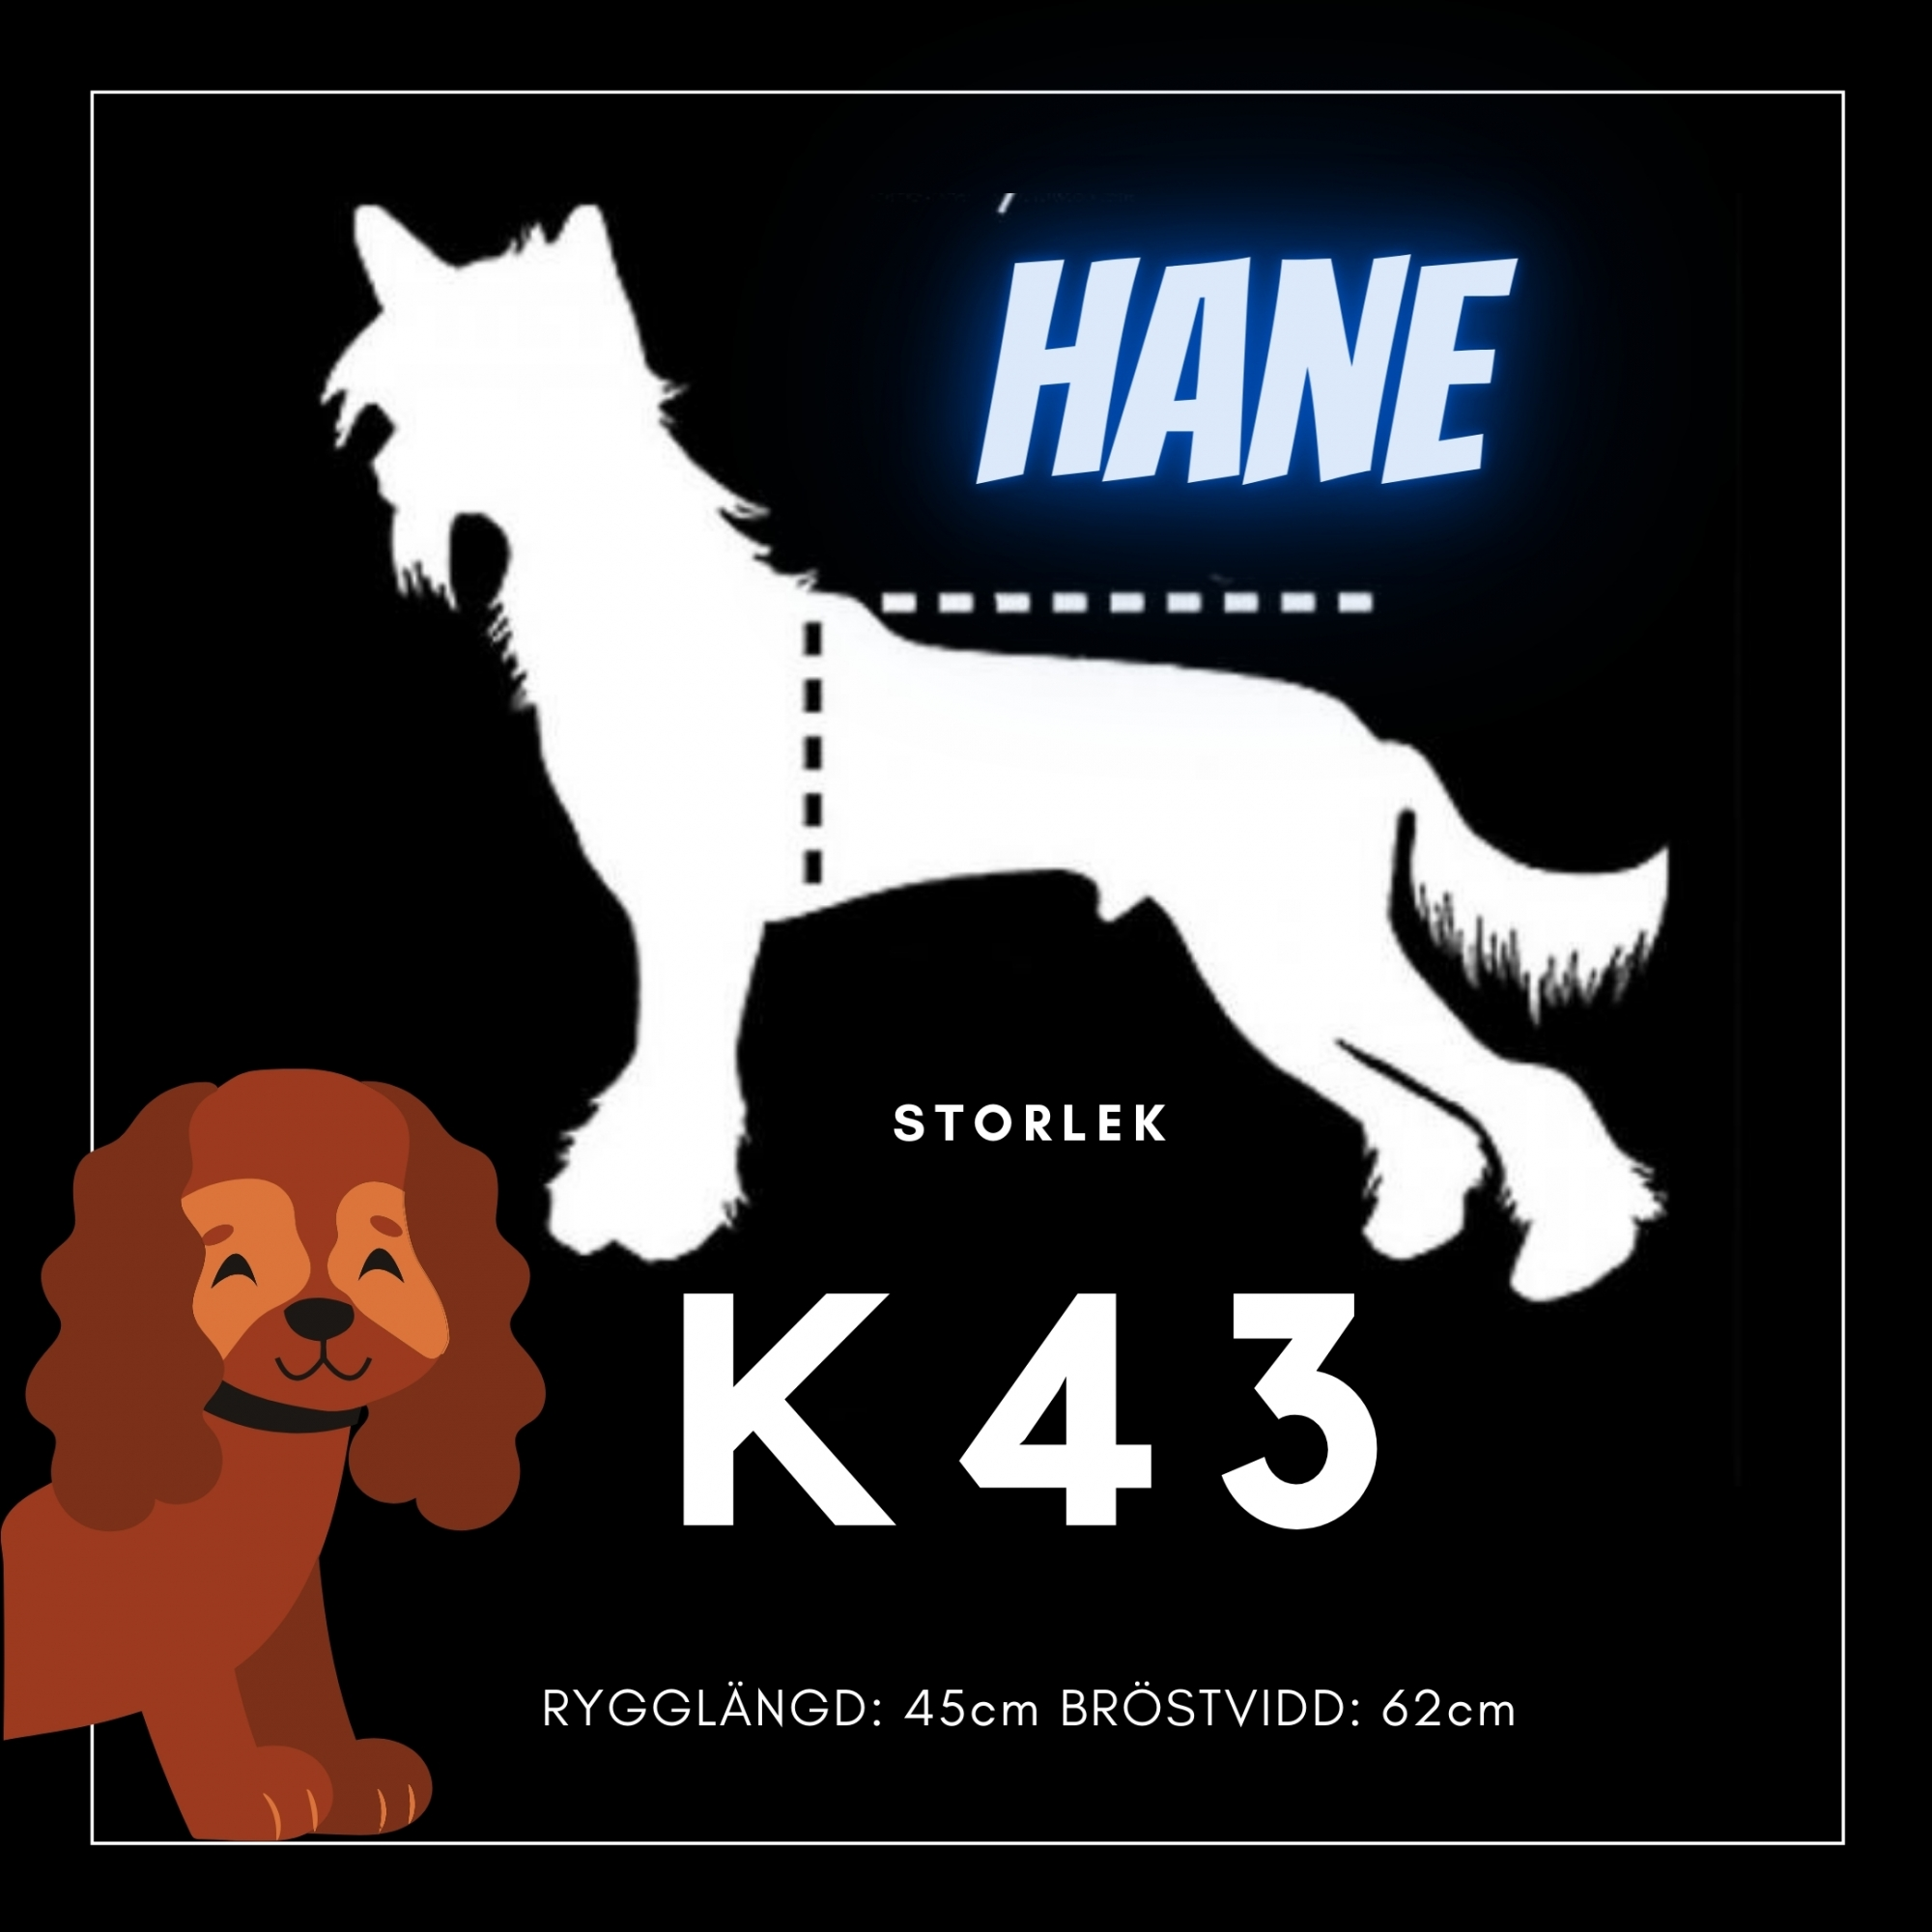 Hane Storlek K43 - Passion For Pet Fashion